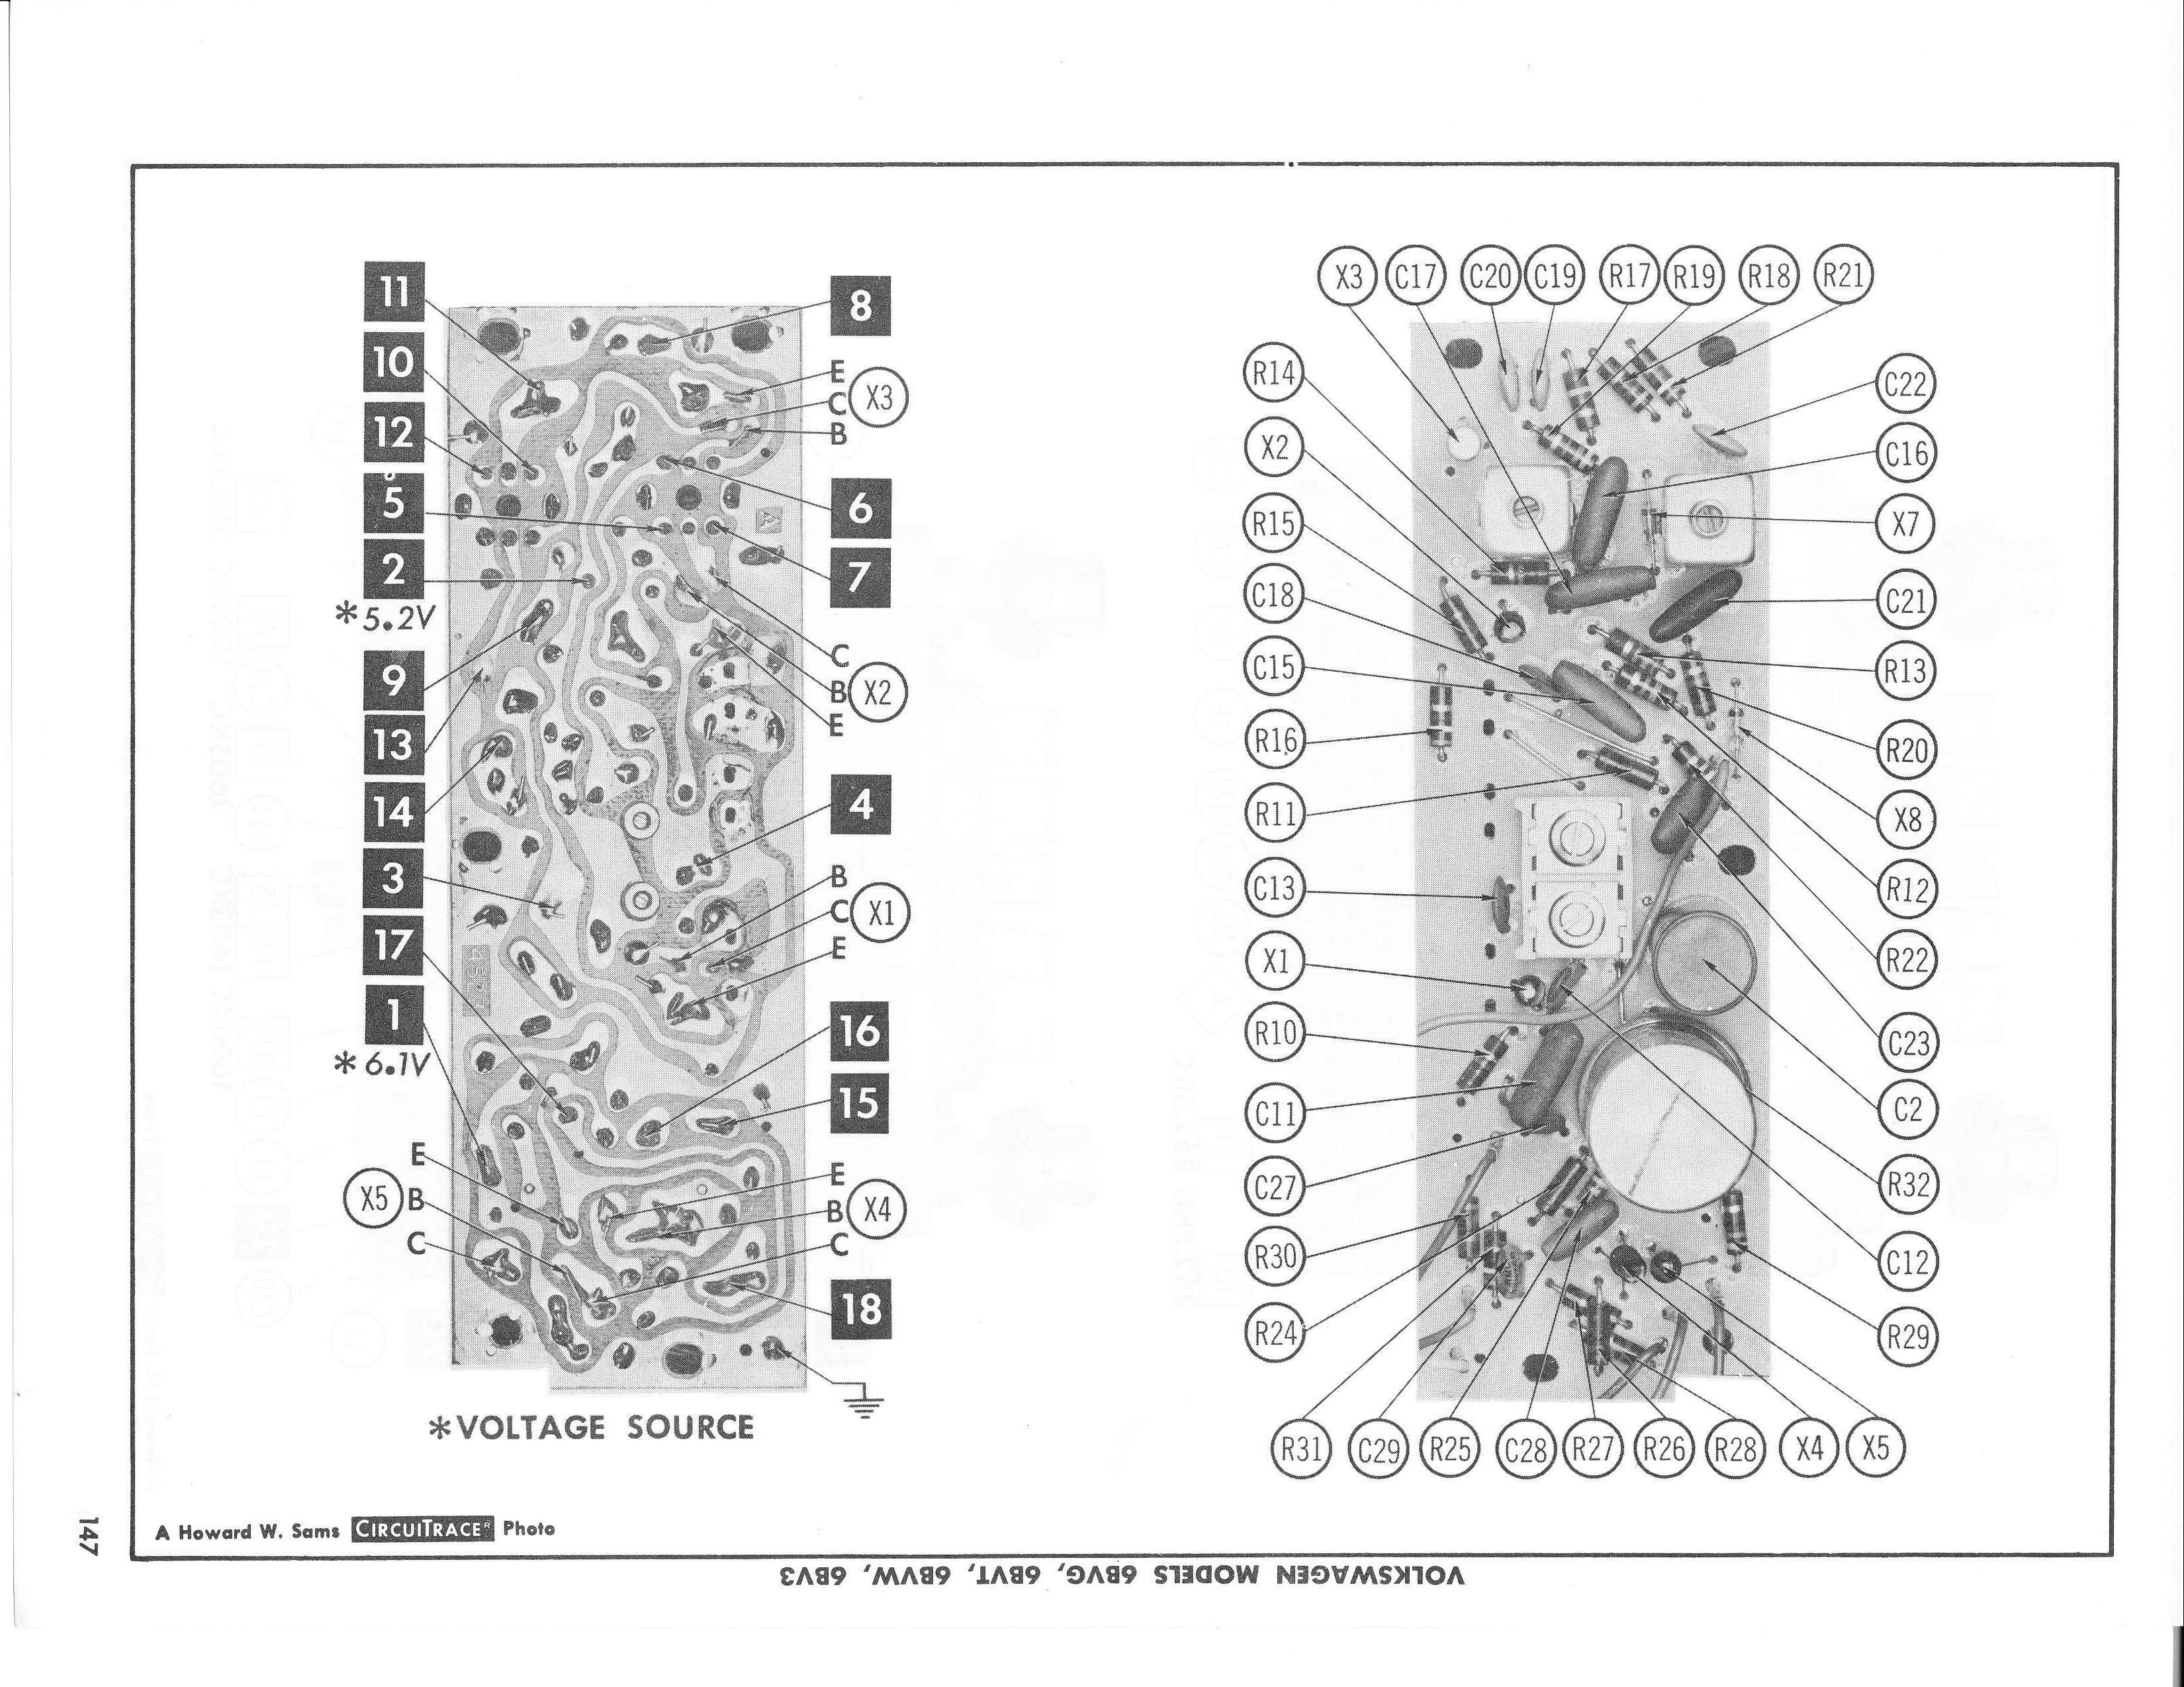 TheSamba.com :: 1966 Sapphire III Photofact Repair booklet